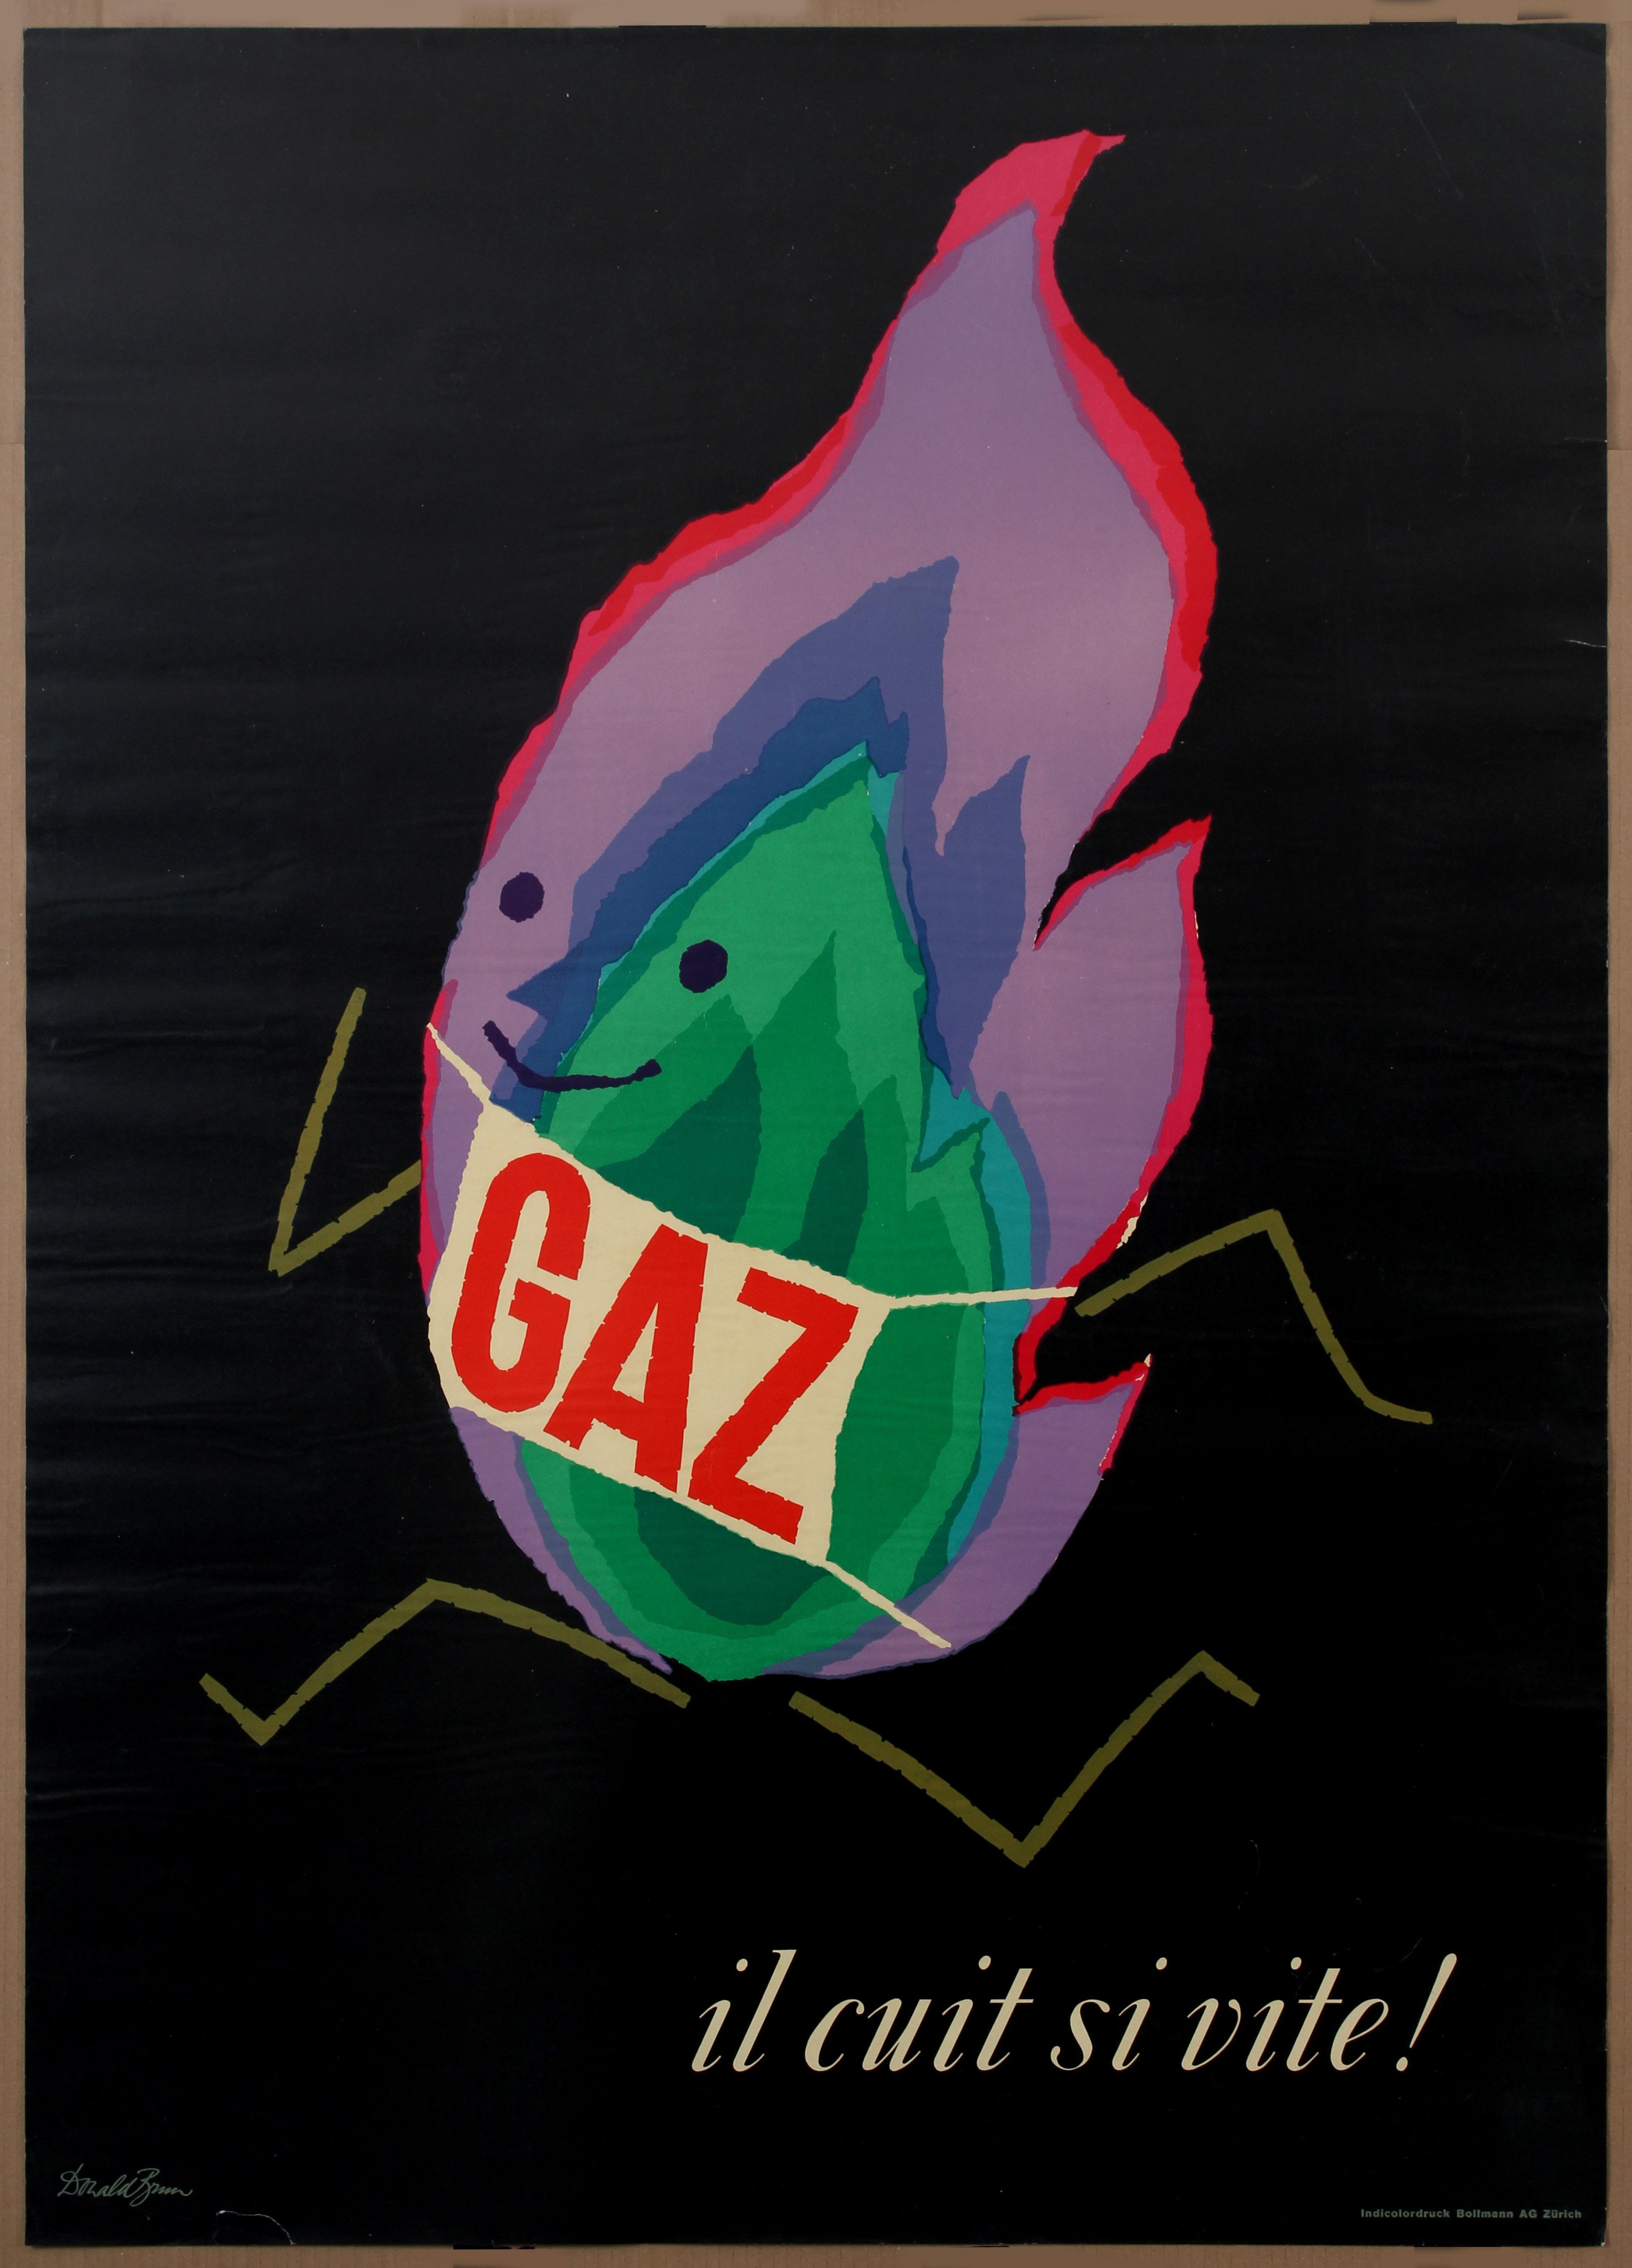 Lot 1523 - Advertising Poster Gas Donald Brun